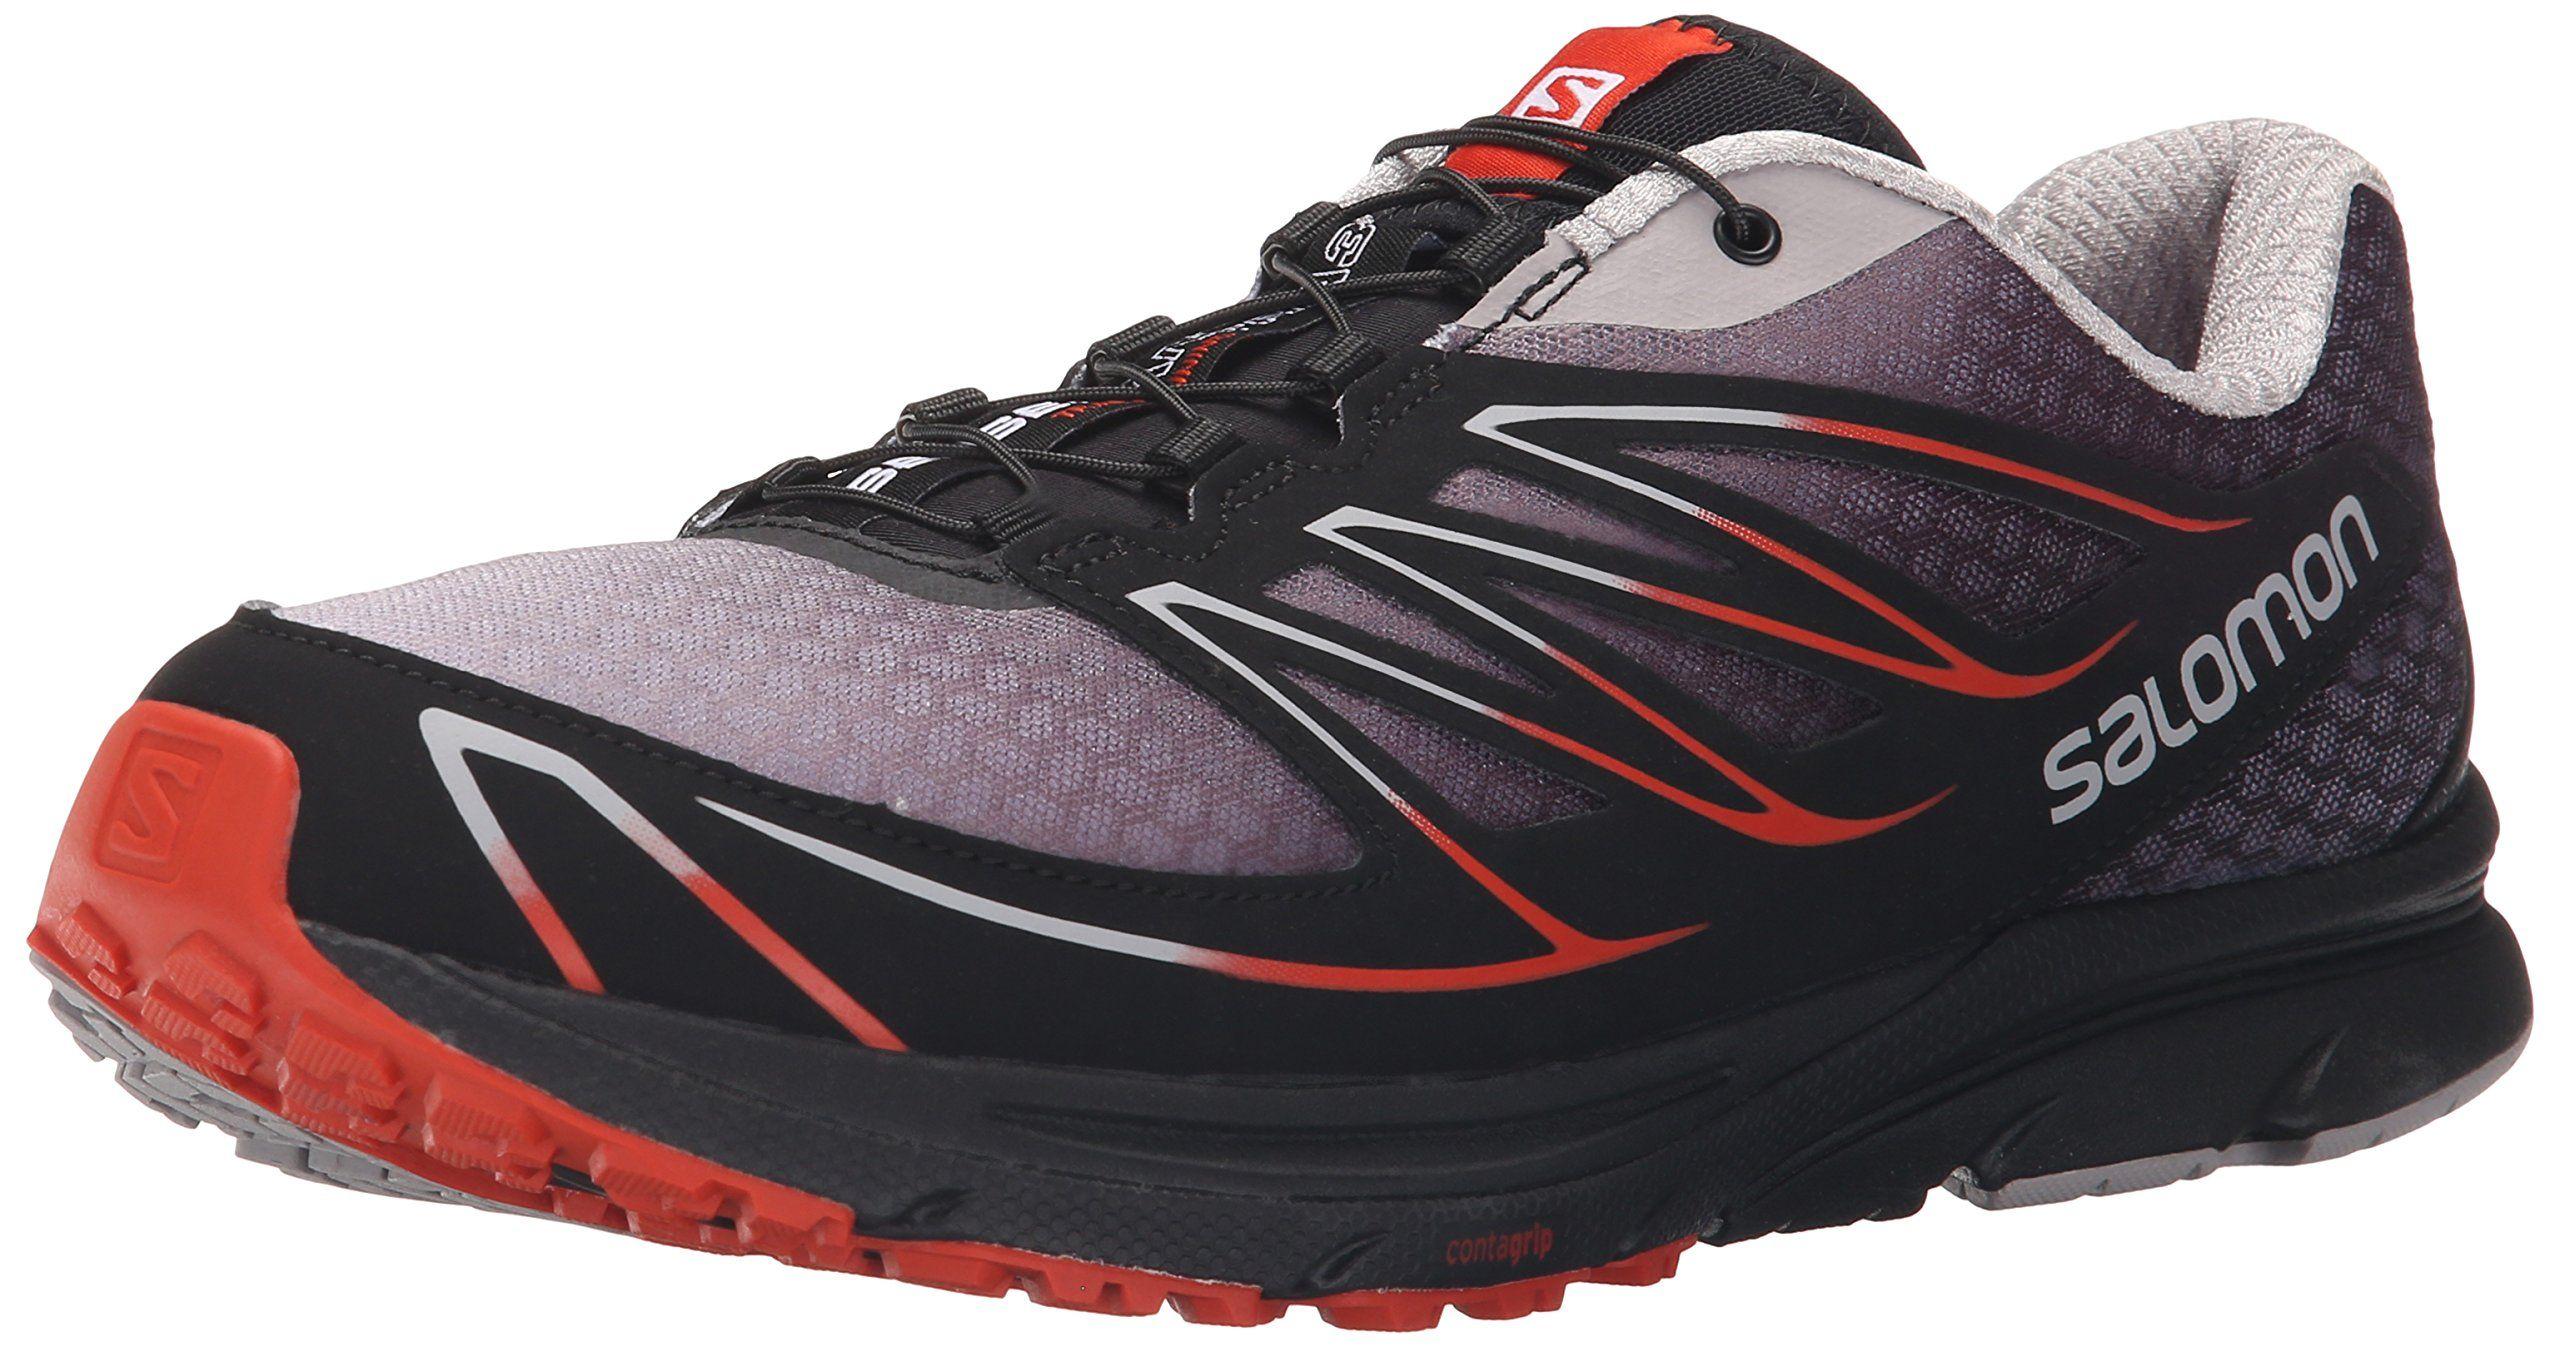 Salomon Men s Sense Mantra 3 Trail Running Shoe 87b3940e71